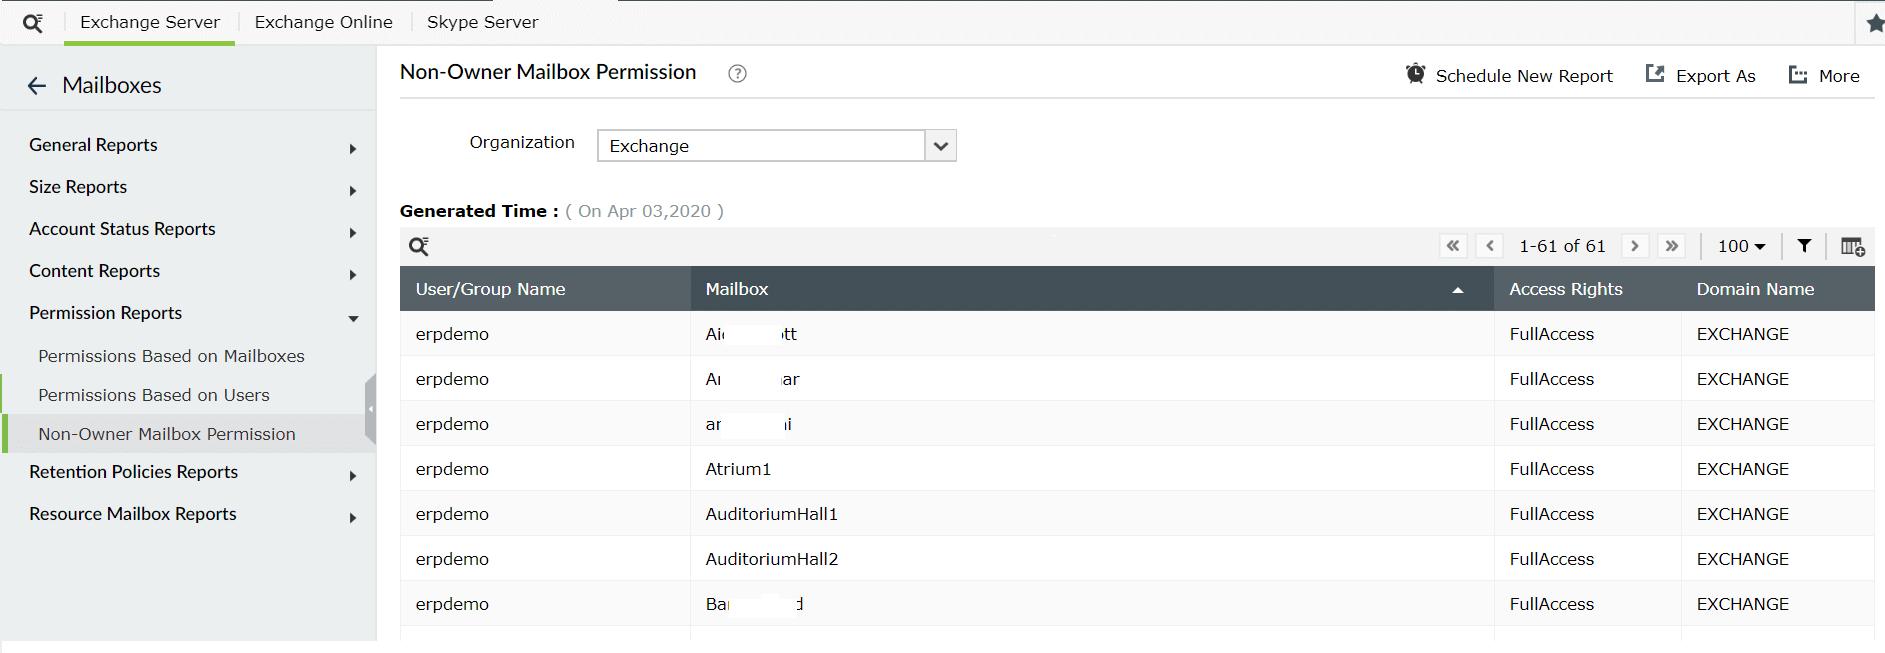 Exchange Mailbox Permission reports - ManageEngine Exchange